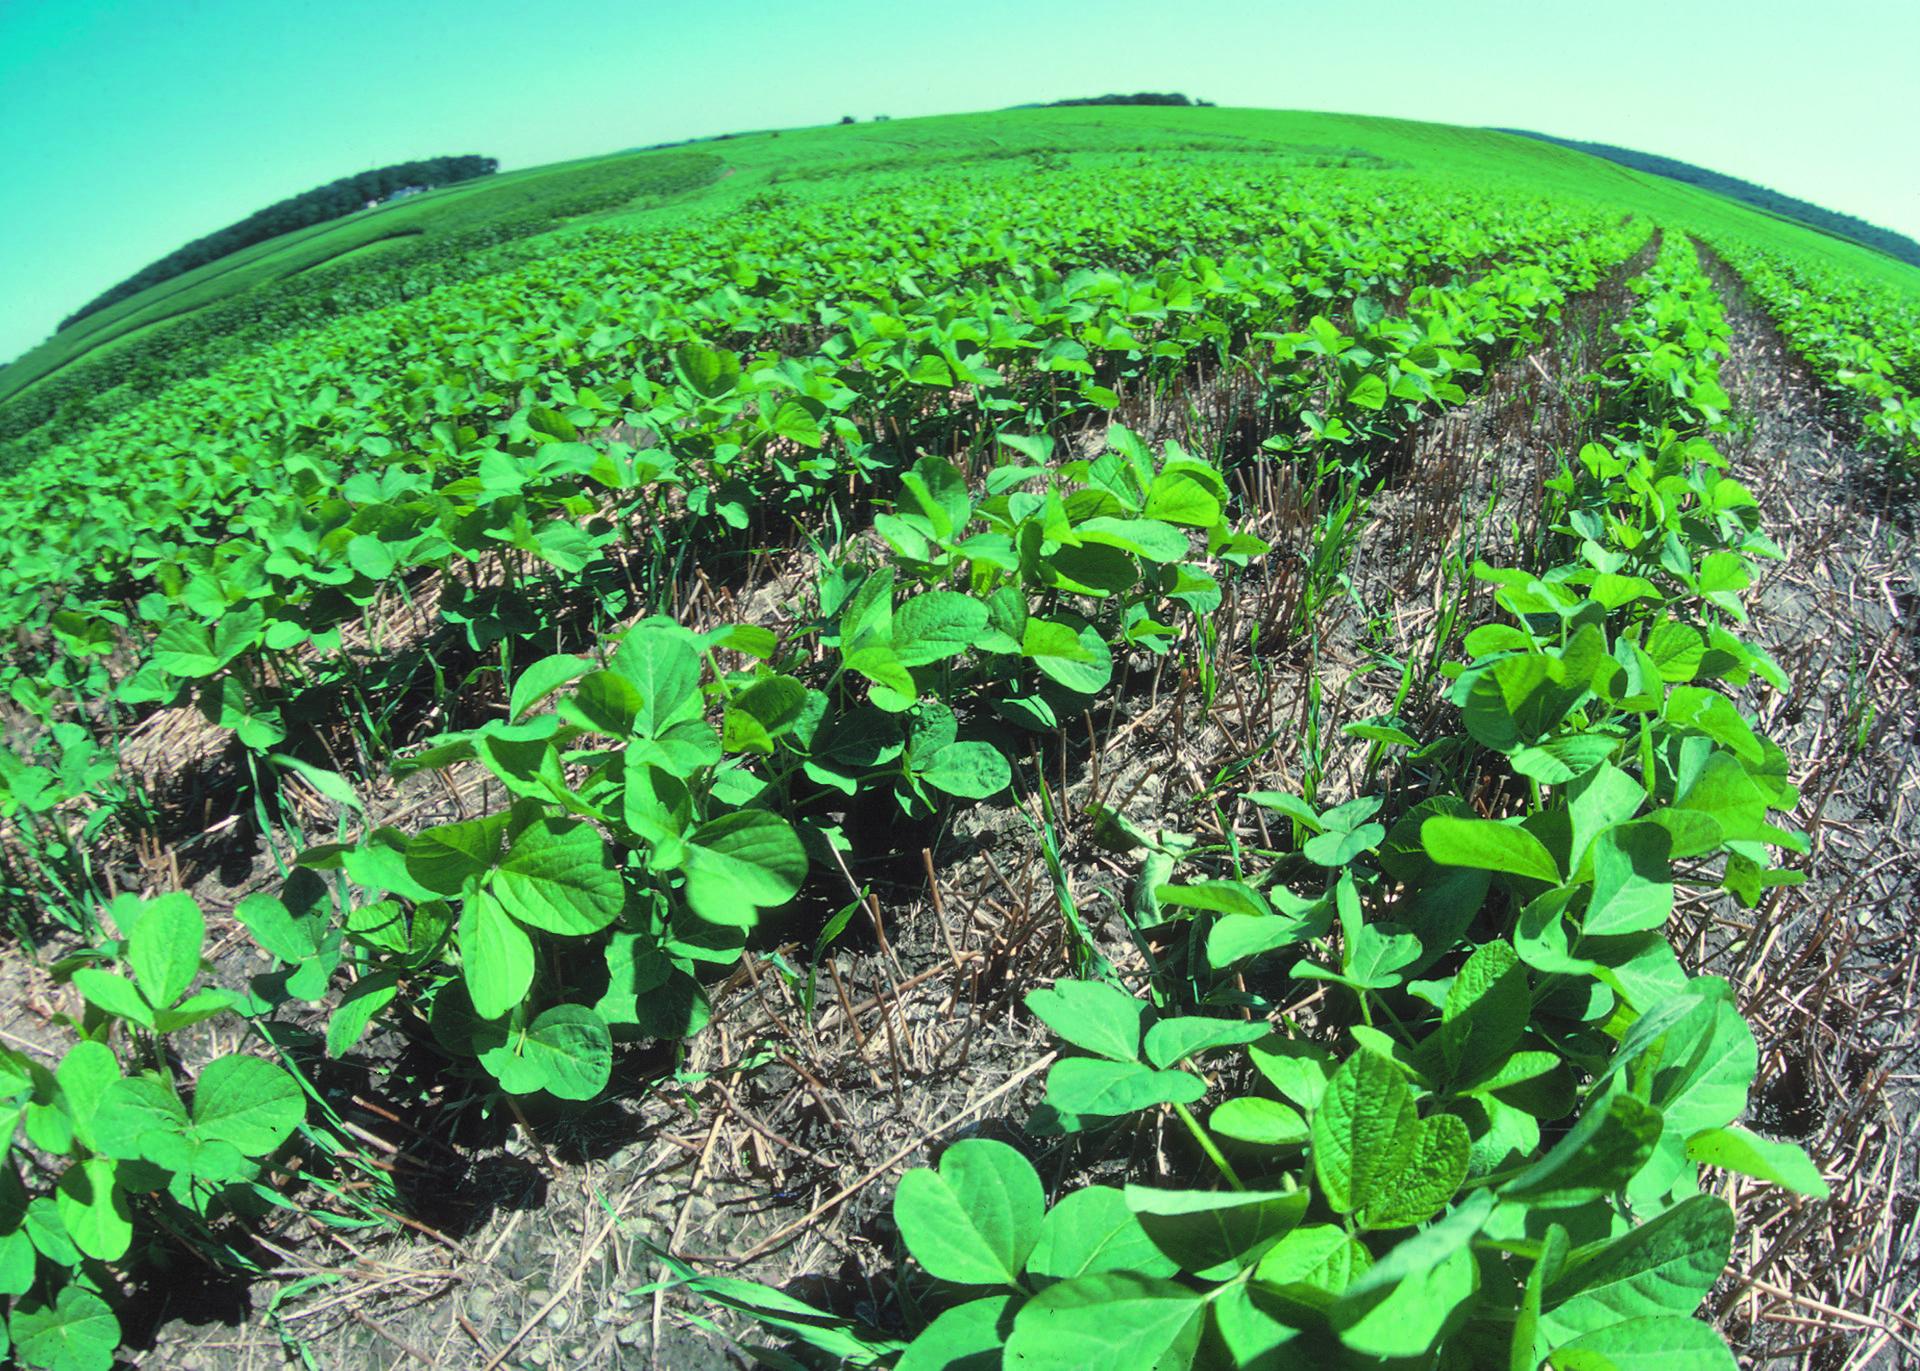 No tillage soybean farm (Wikipedia)